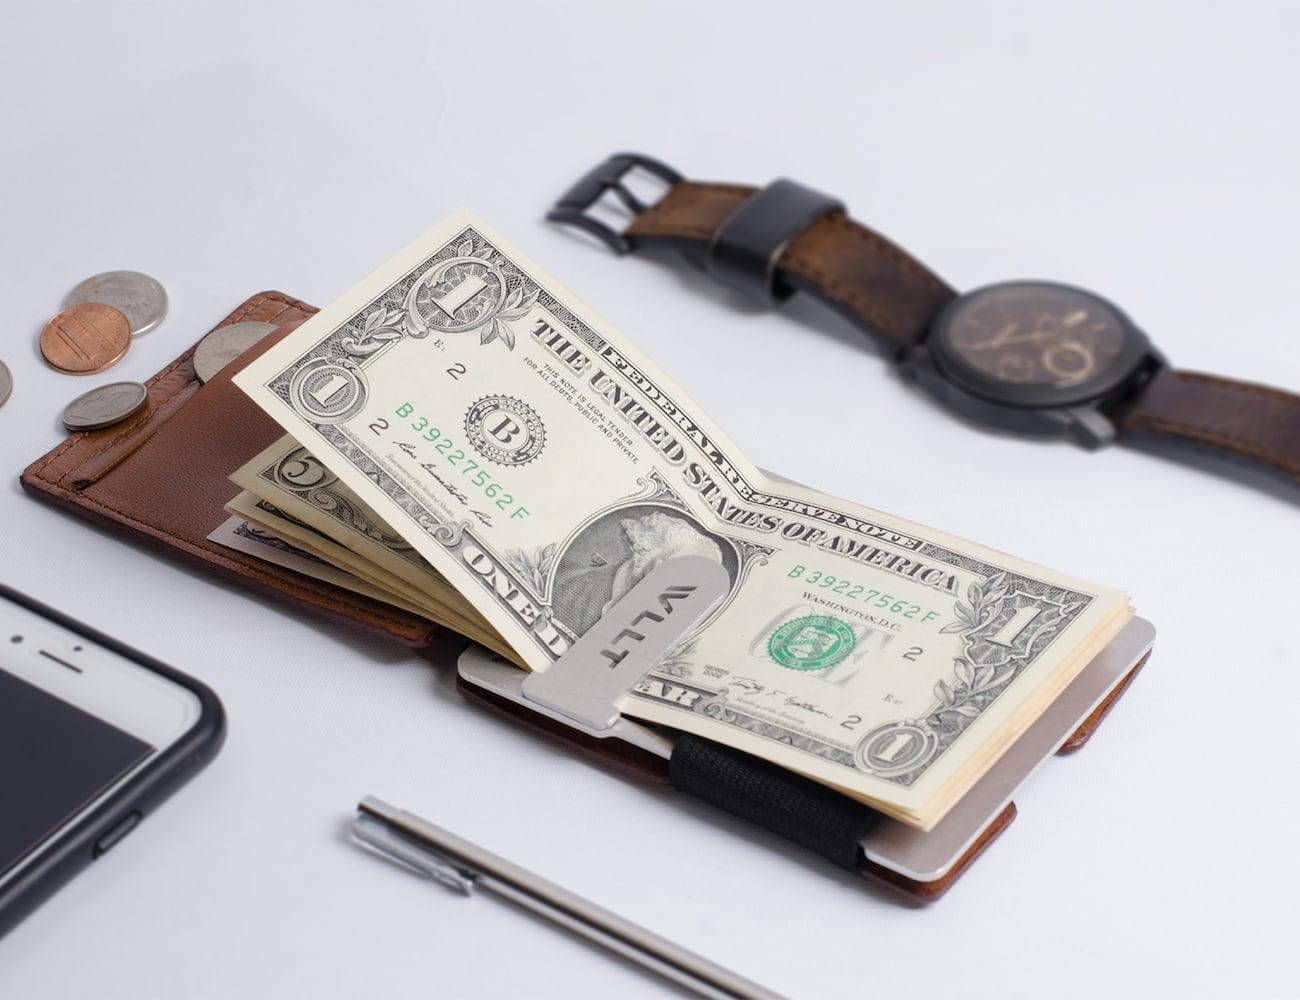 WLLT Customizable Minimalist Wallet